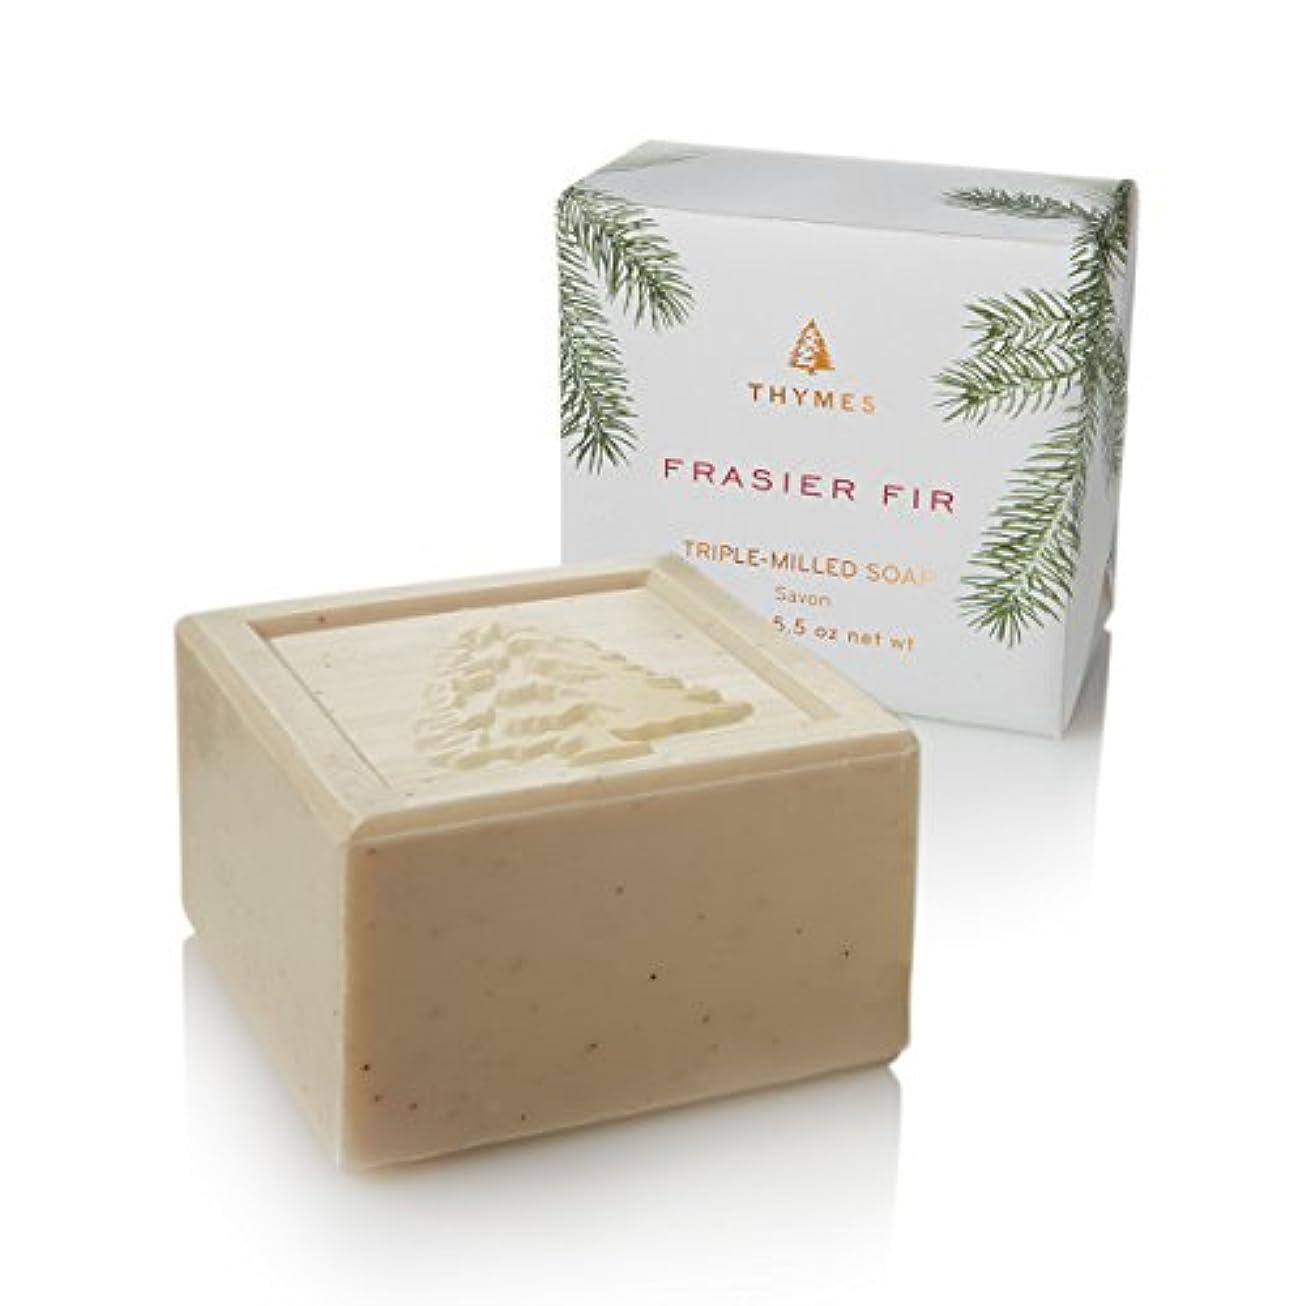 Thymes Frasier Fir Bar Soap 155g/5.5oz